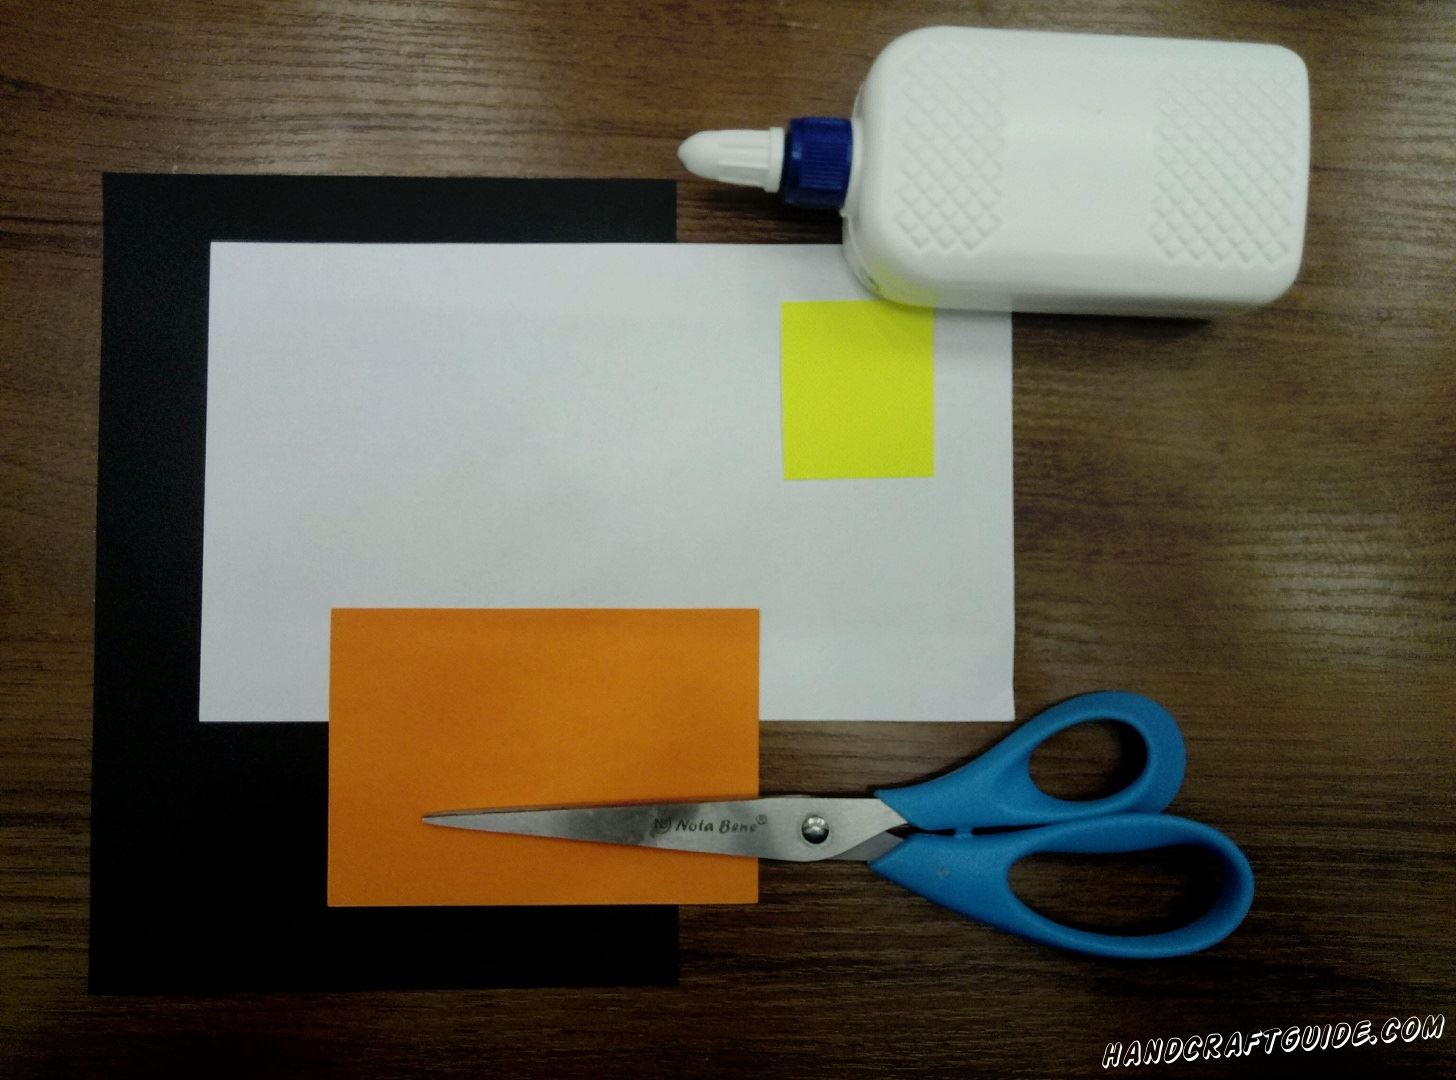 Нам понадобится: Цветная бумага: оранжевая, чёрная, белая, желтая Ножницы Клей ПВА